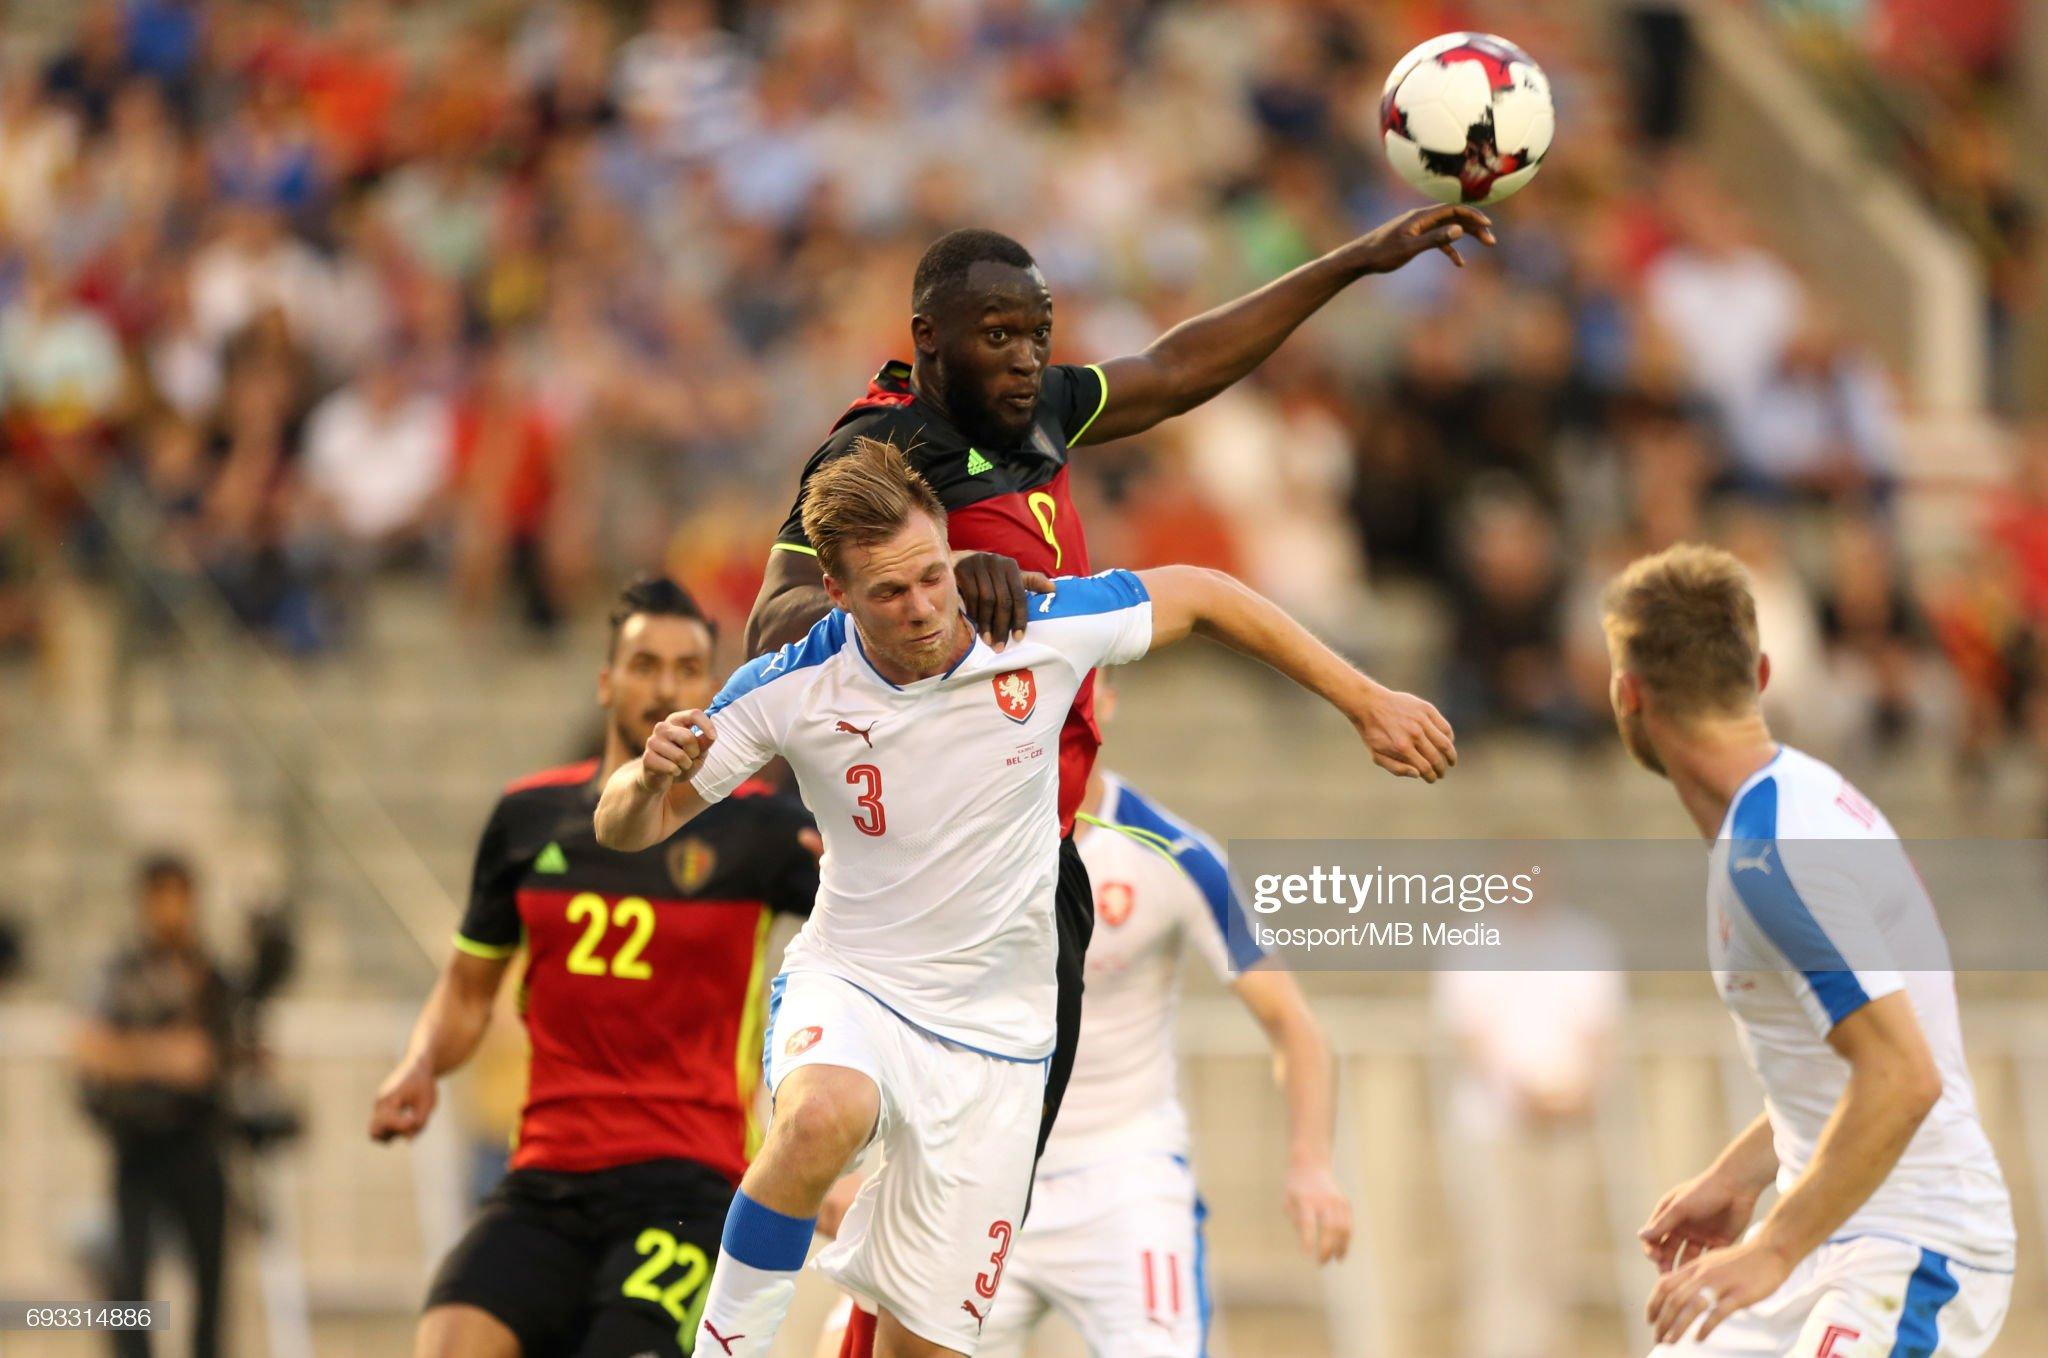 Czech Republic vs Belgium Preview, prediction and odds